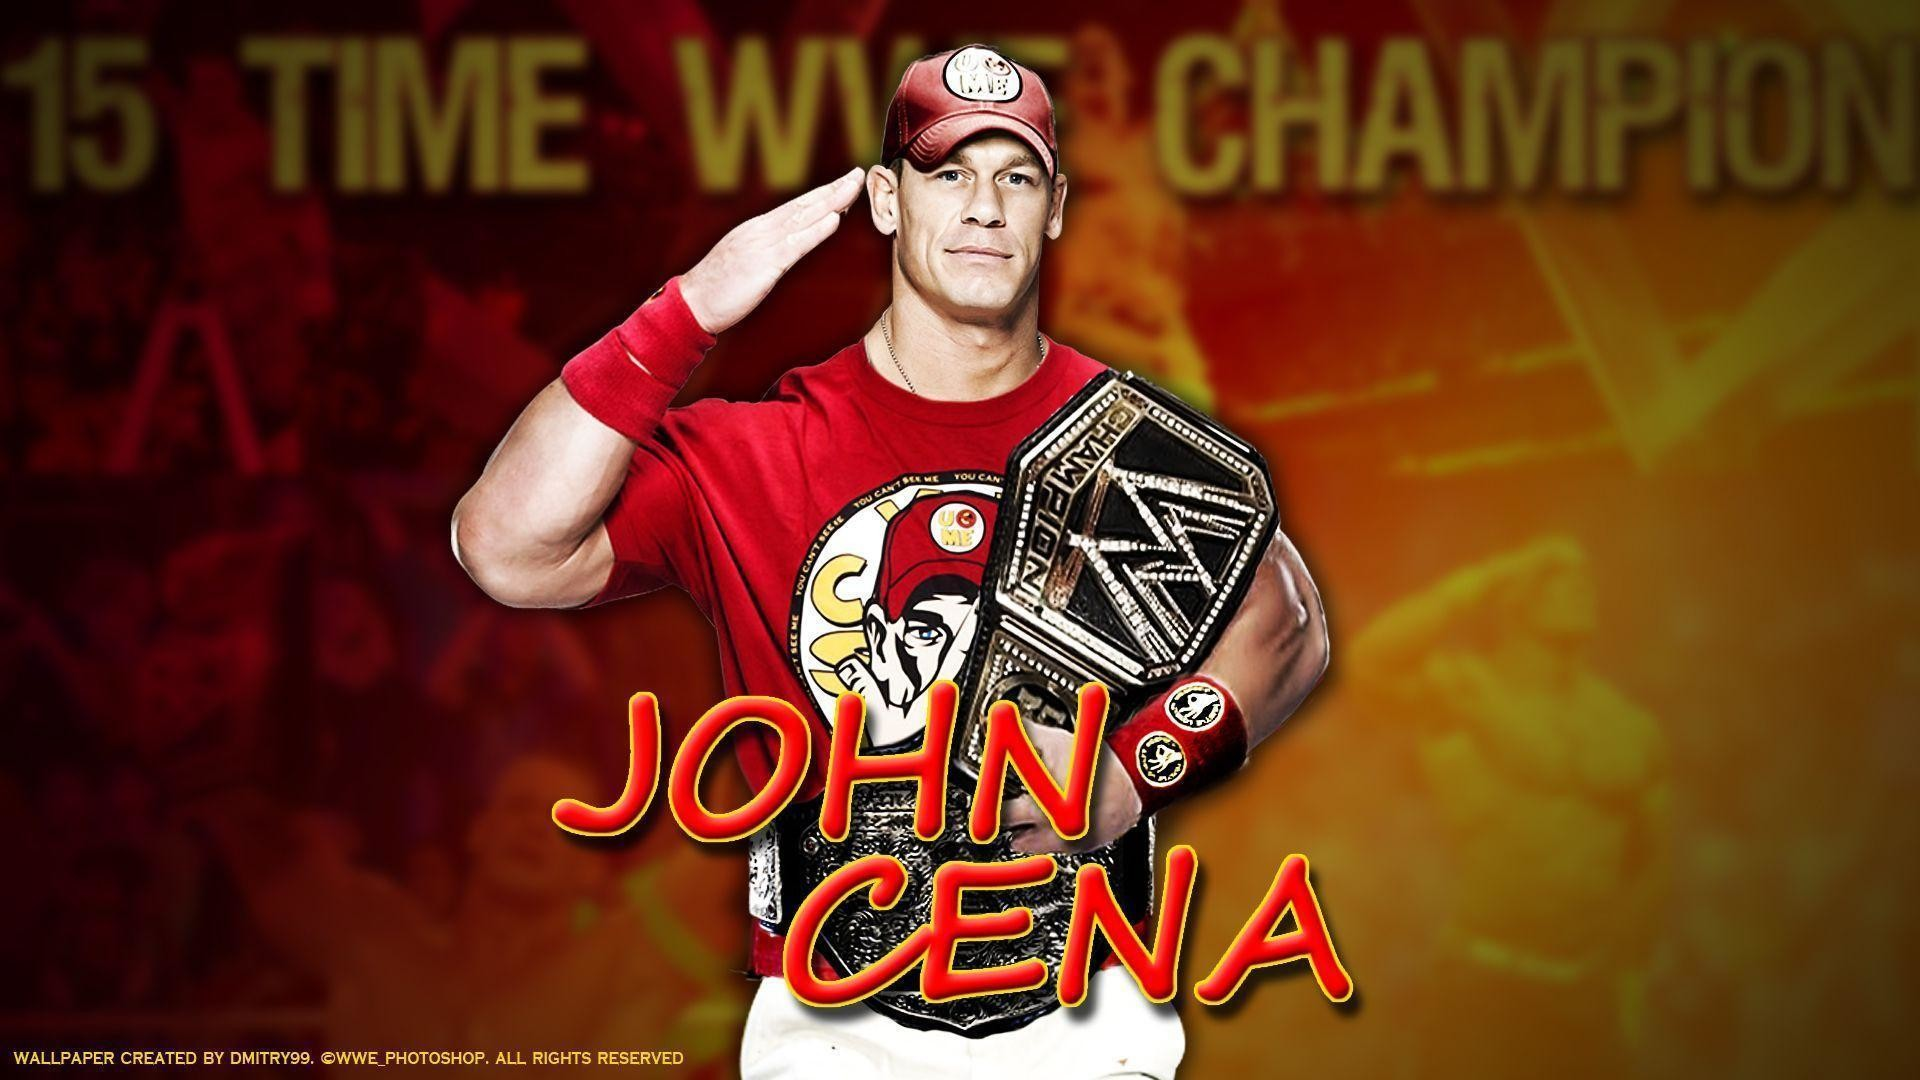 John Cena New HD Wallpapers (68+ images)